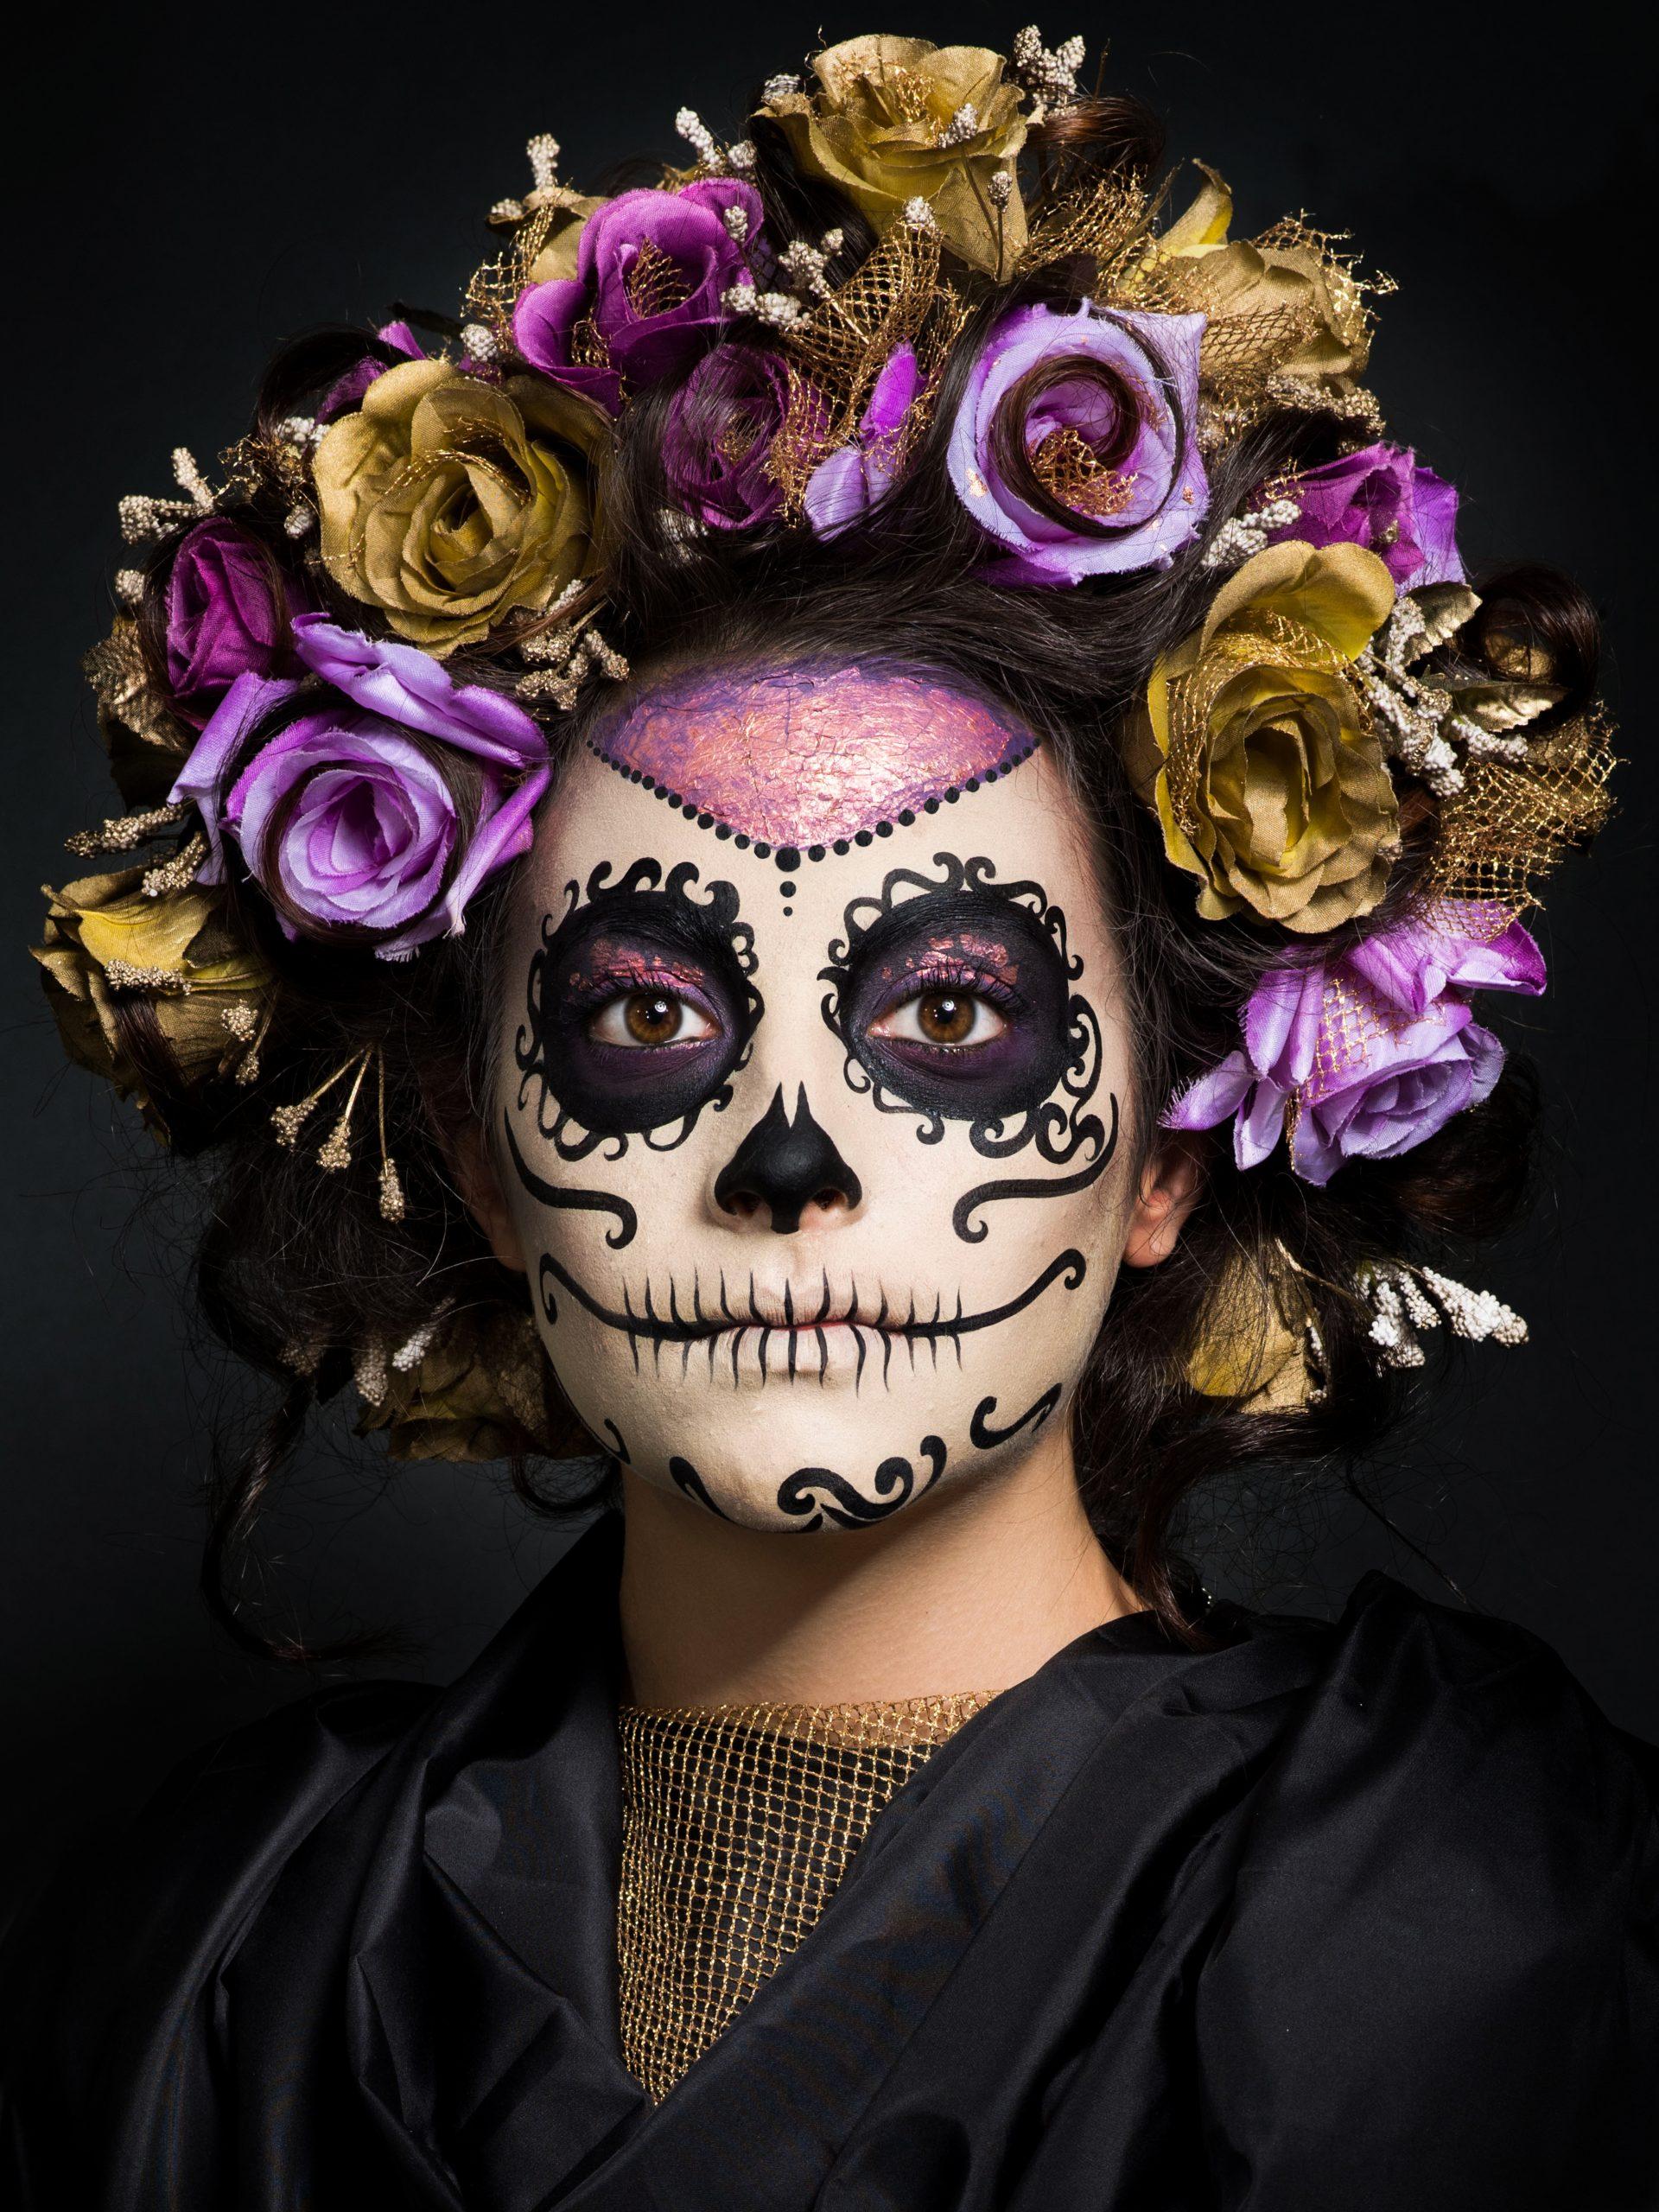 Sugar Skull makeup, purple an gold roses